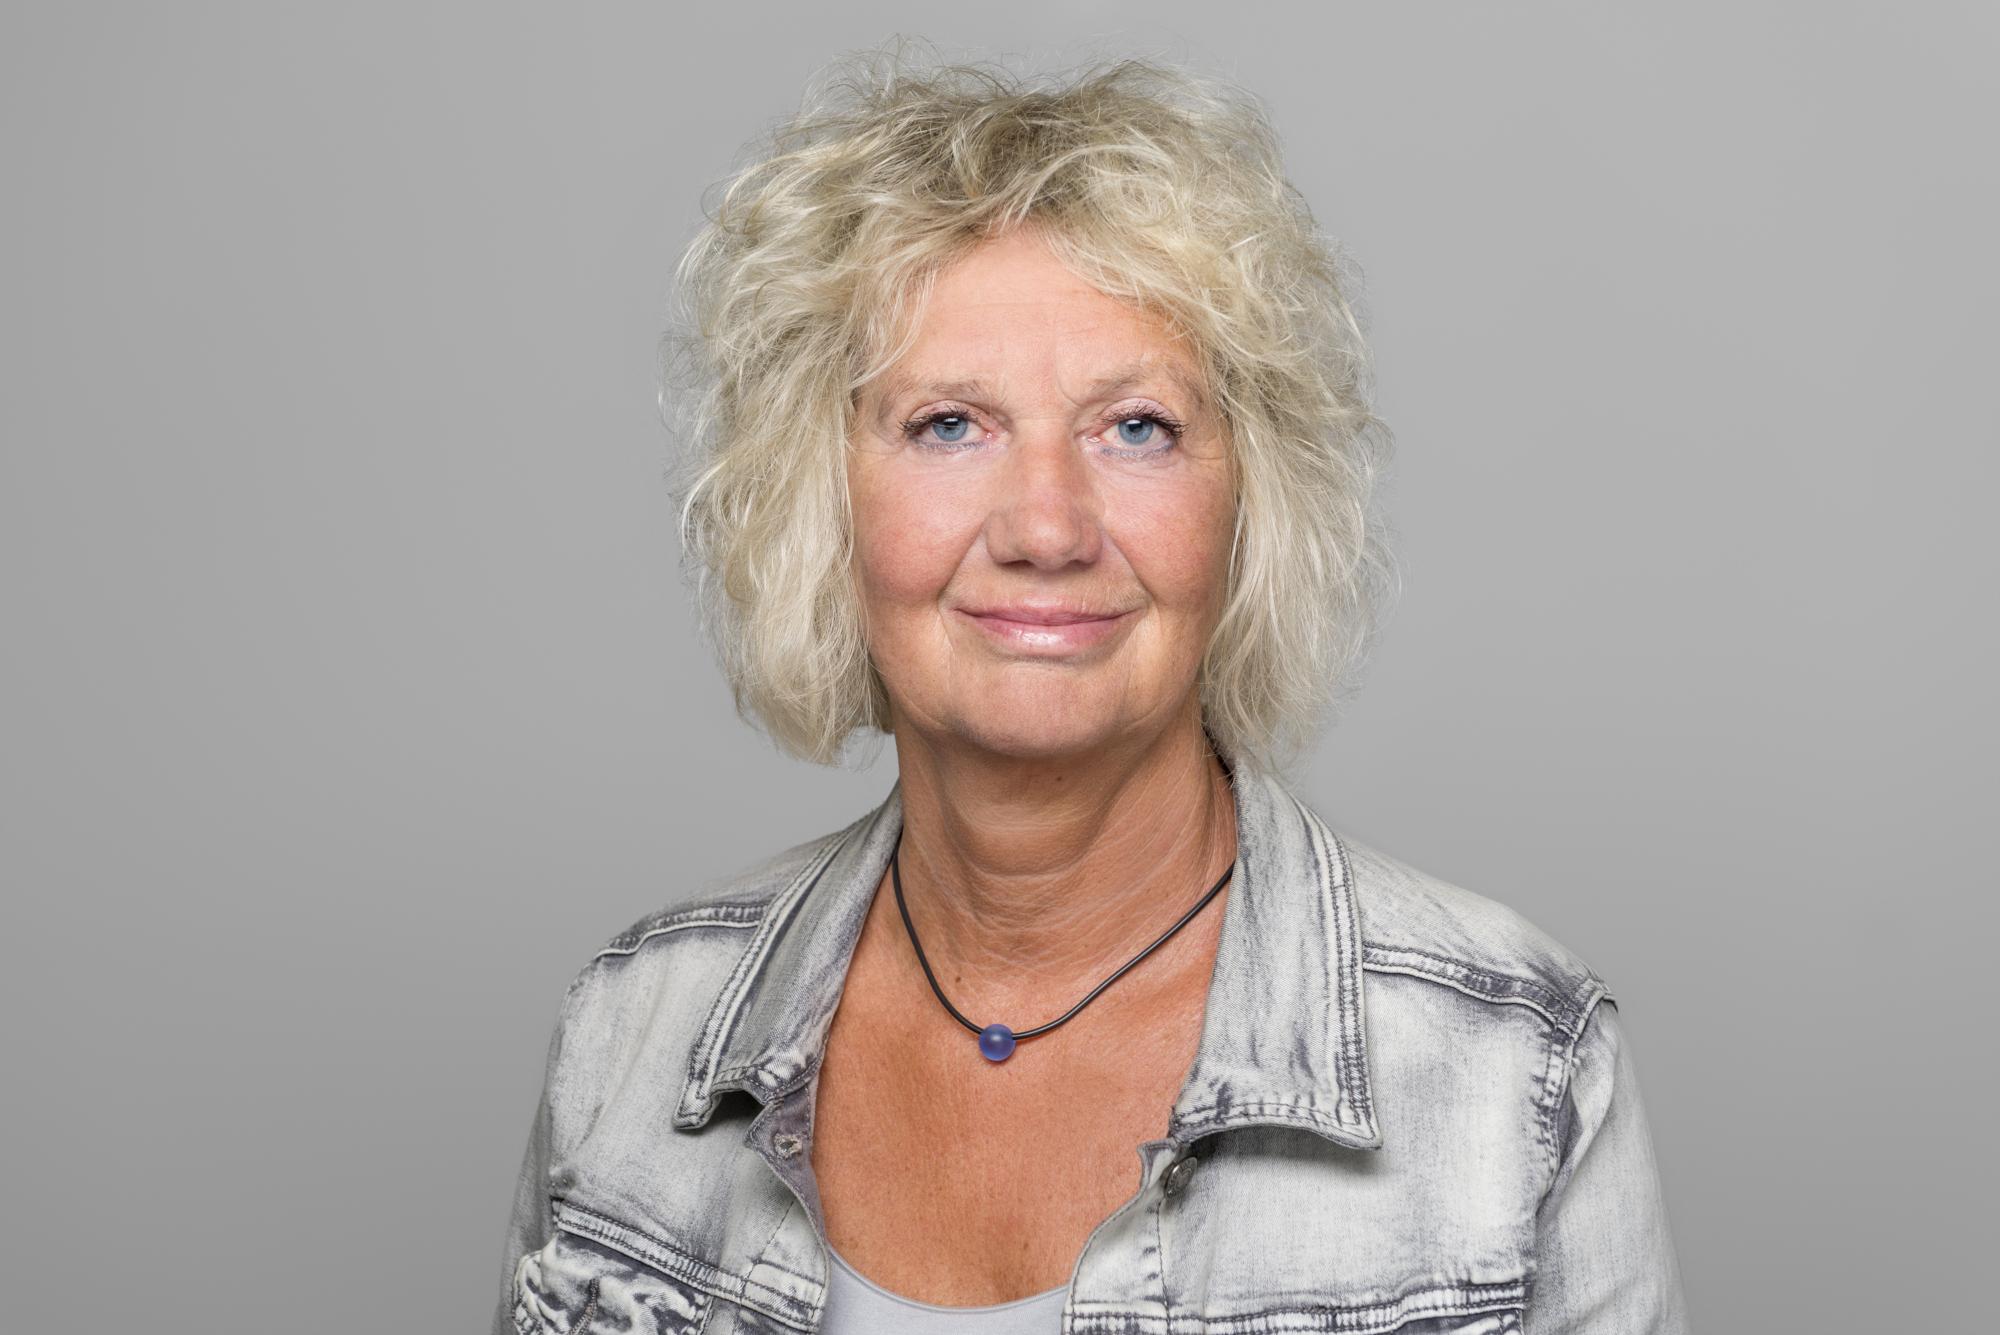 Heike Siekmann